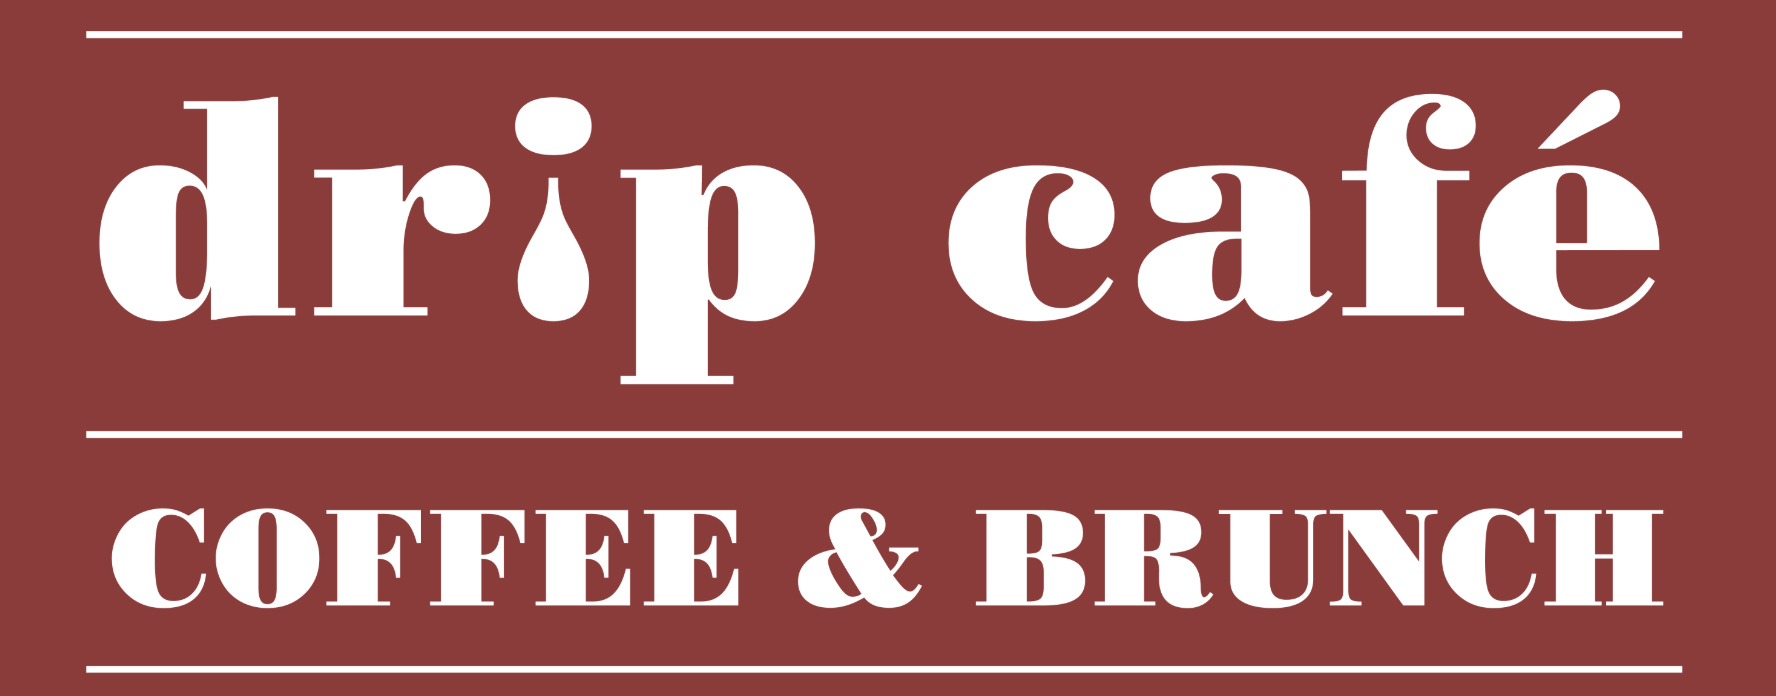 DripCafe.jpg